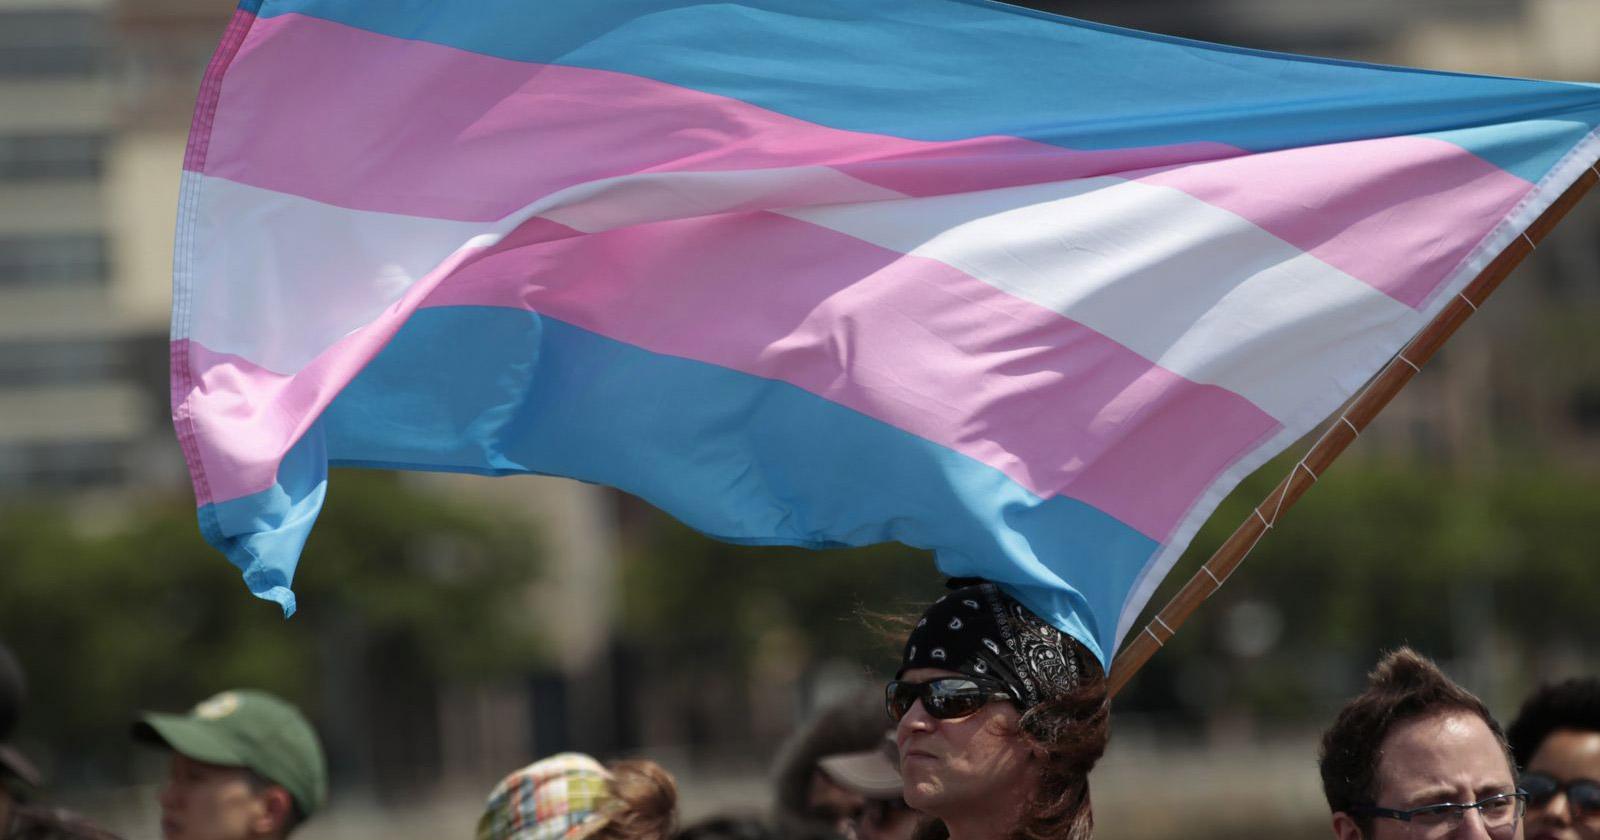 Transgender flag being flown to represent trans awareness week.